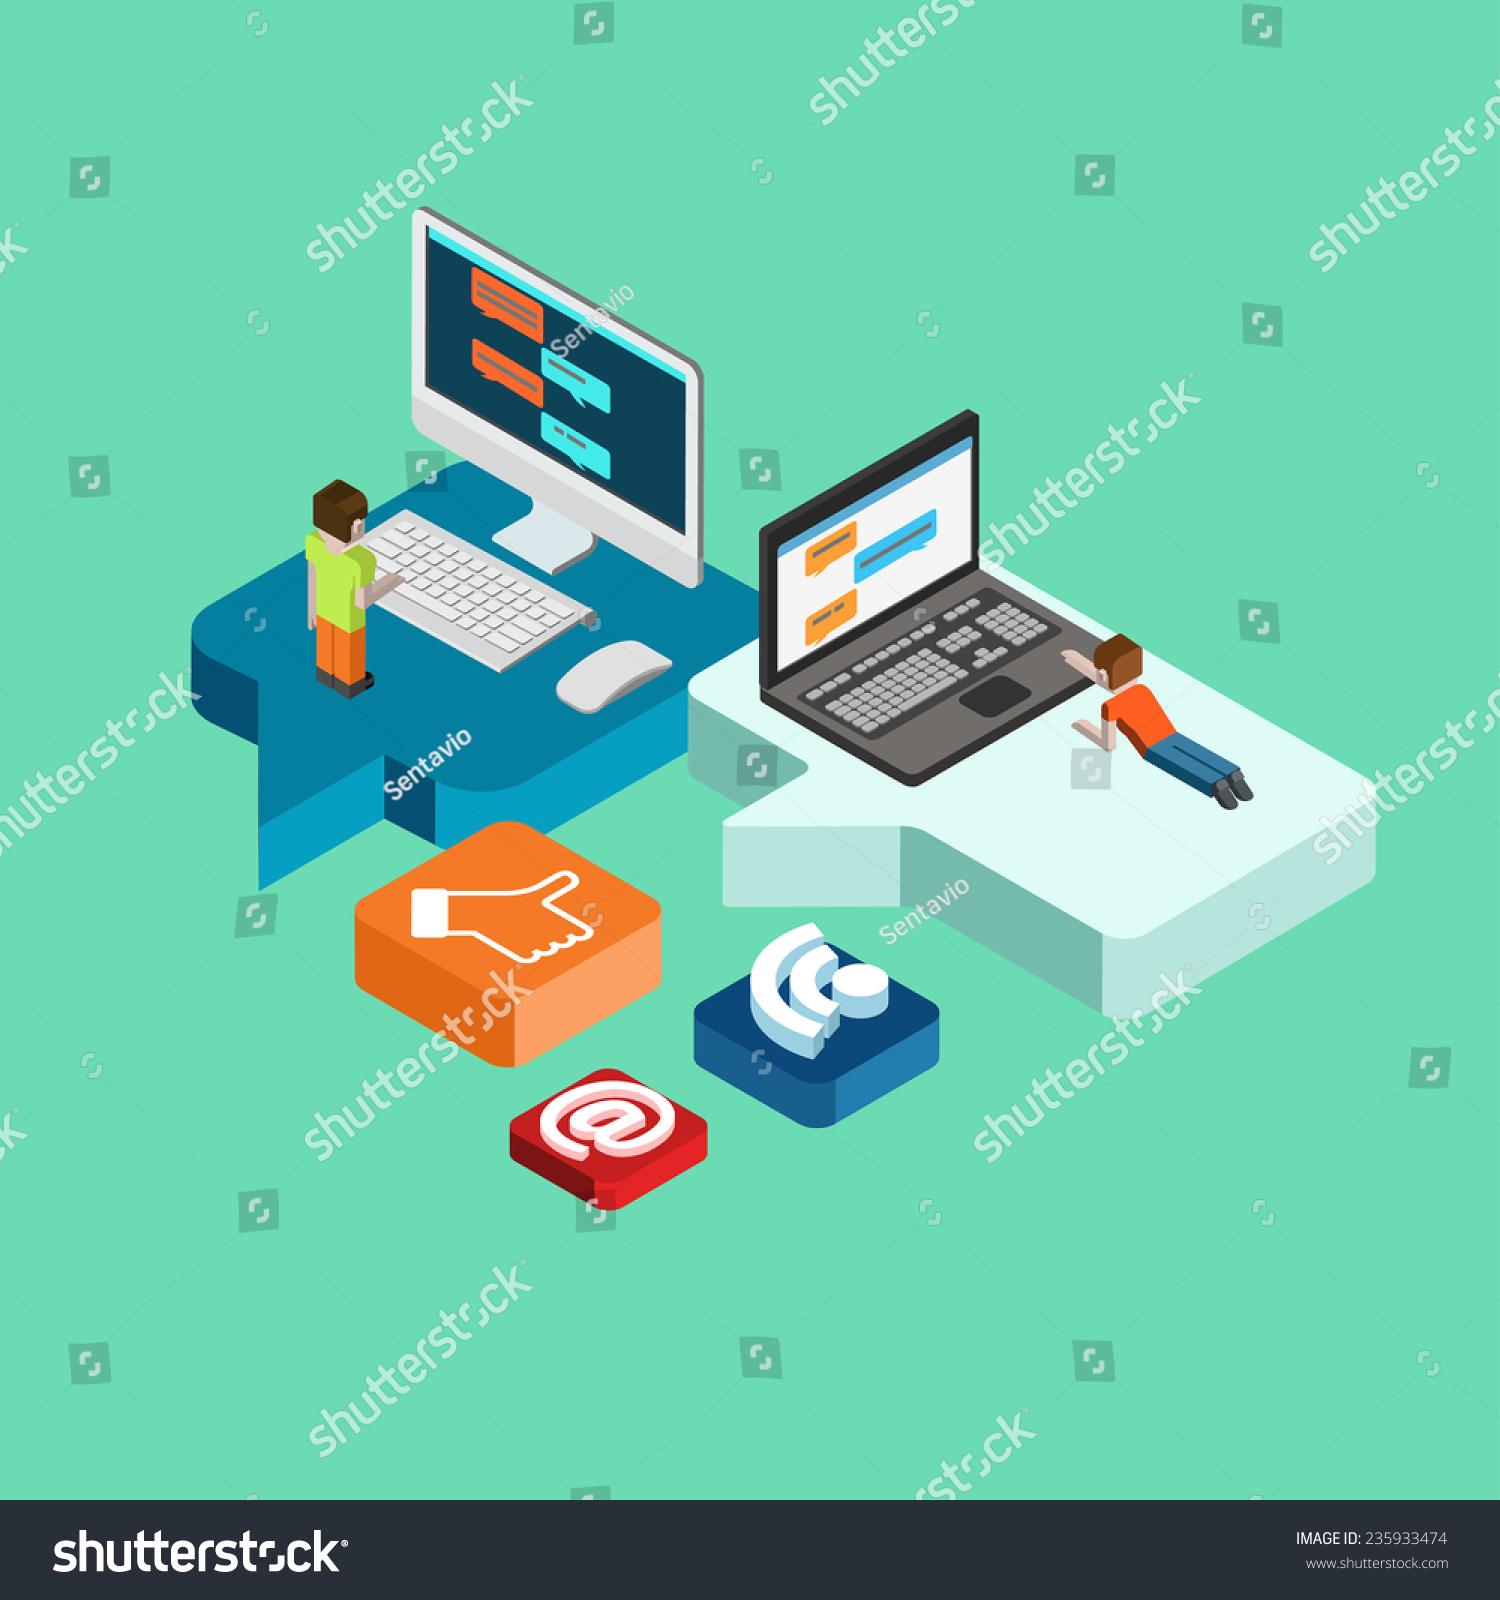 Chat Message Social Media Flat 3d Stock Vector 235933474 - Shutterstock